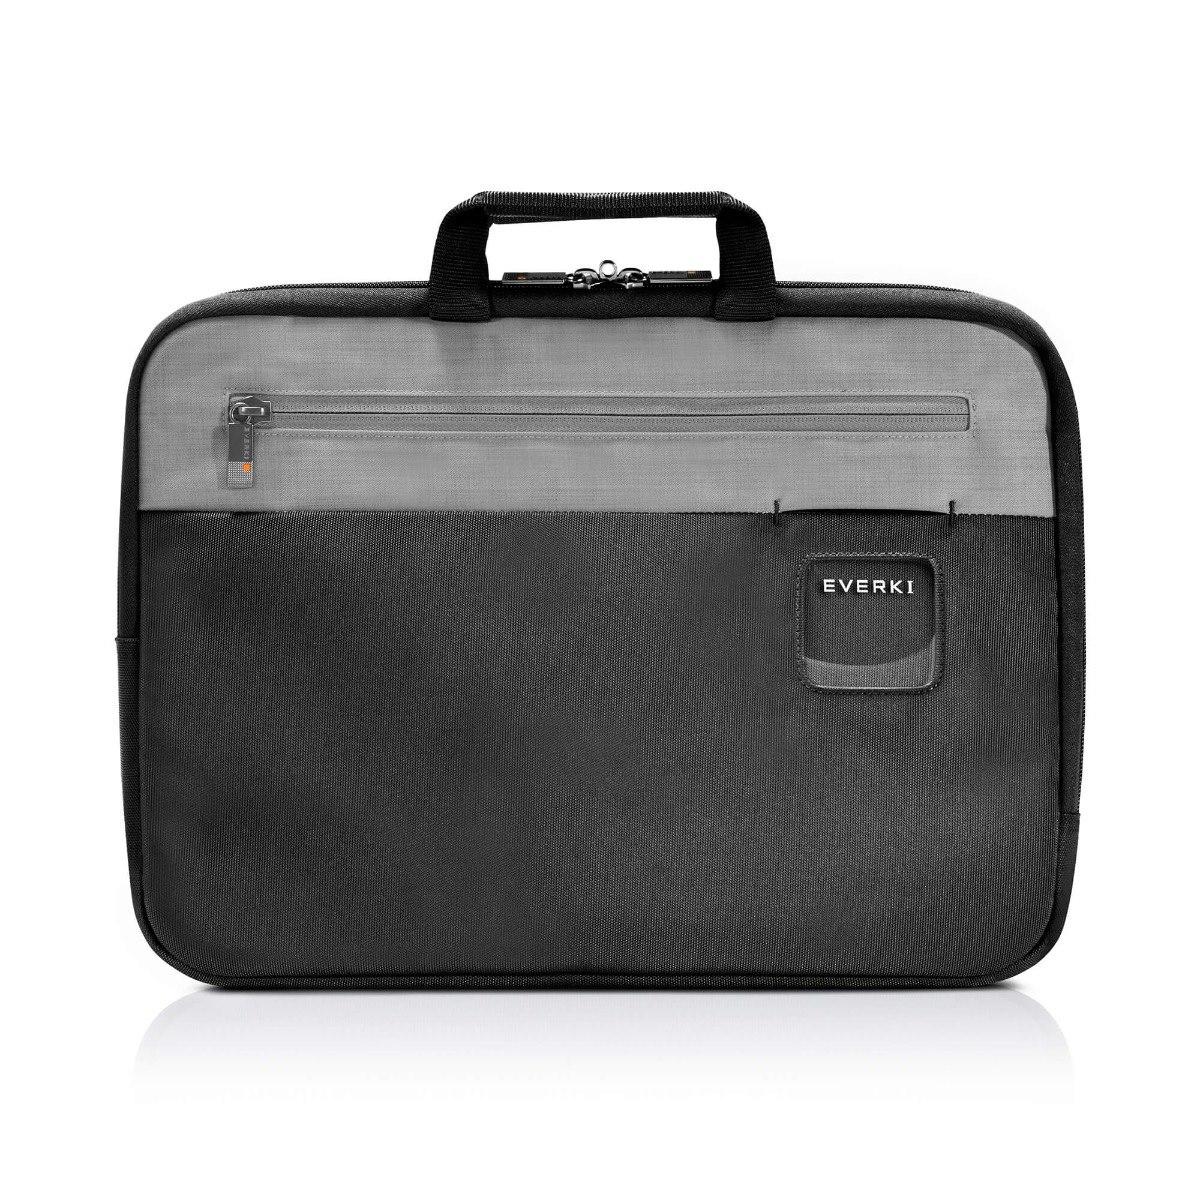 "Everki Carrying Case for 39.6 cm (15.6"")"